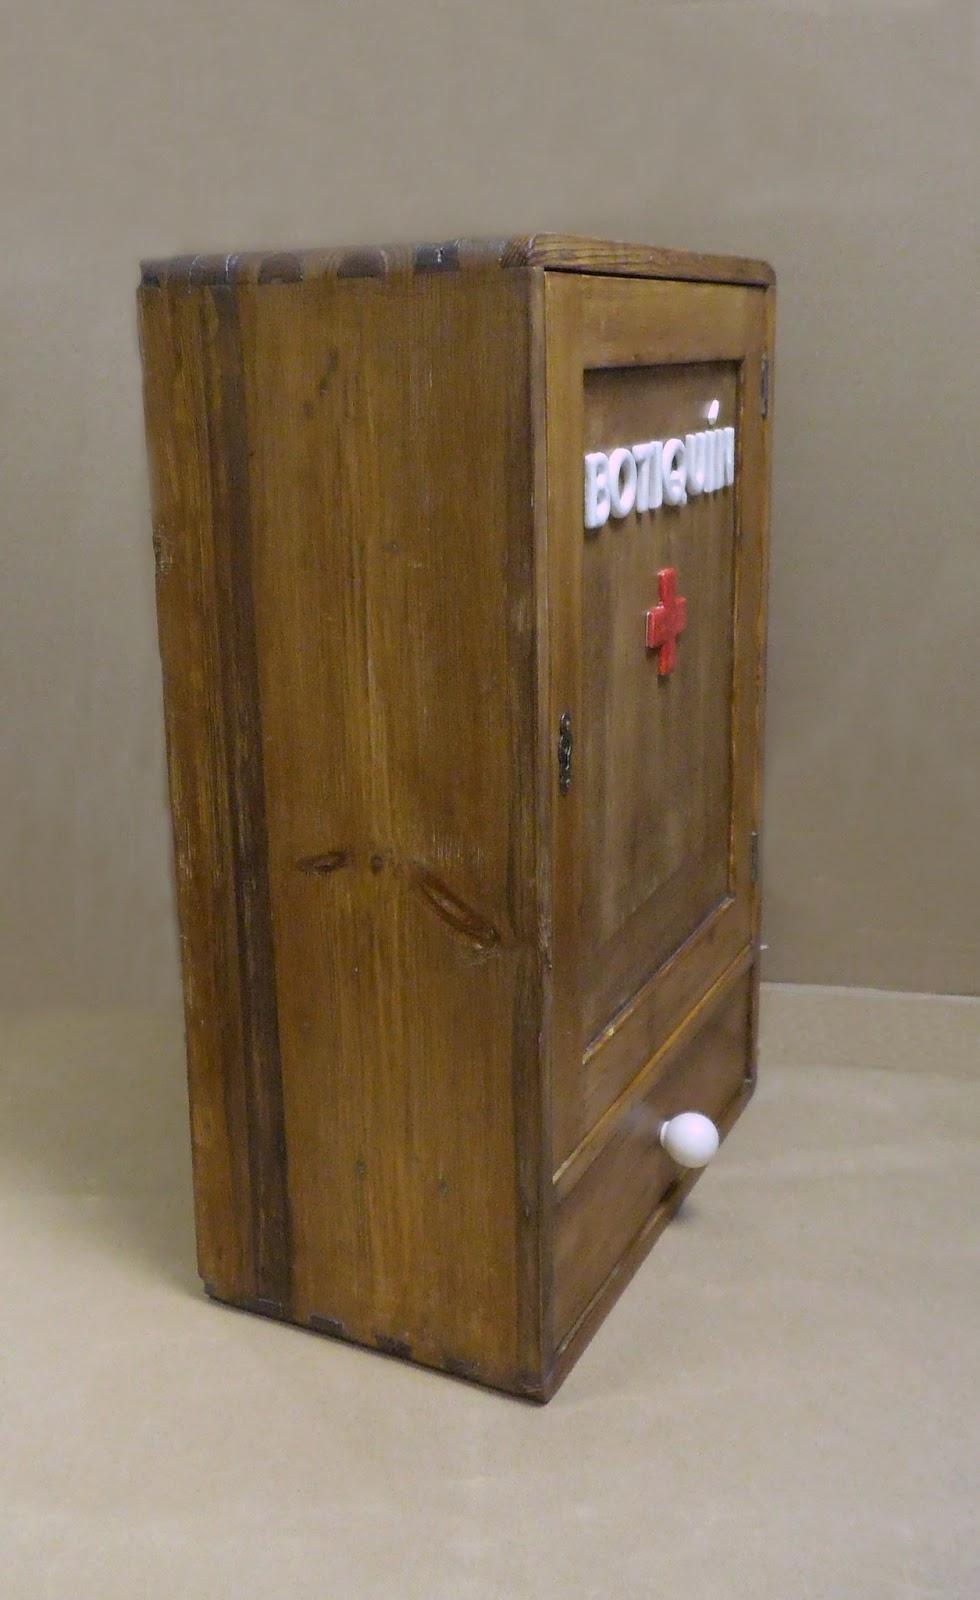 Renovarte muebles curso de restauraci n de muebles botiqu n - Clases de restauracion de muebles ...